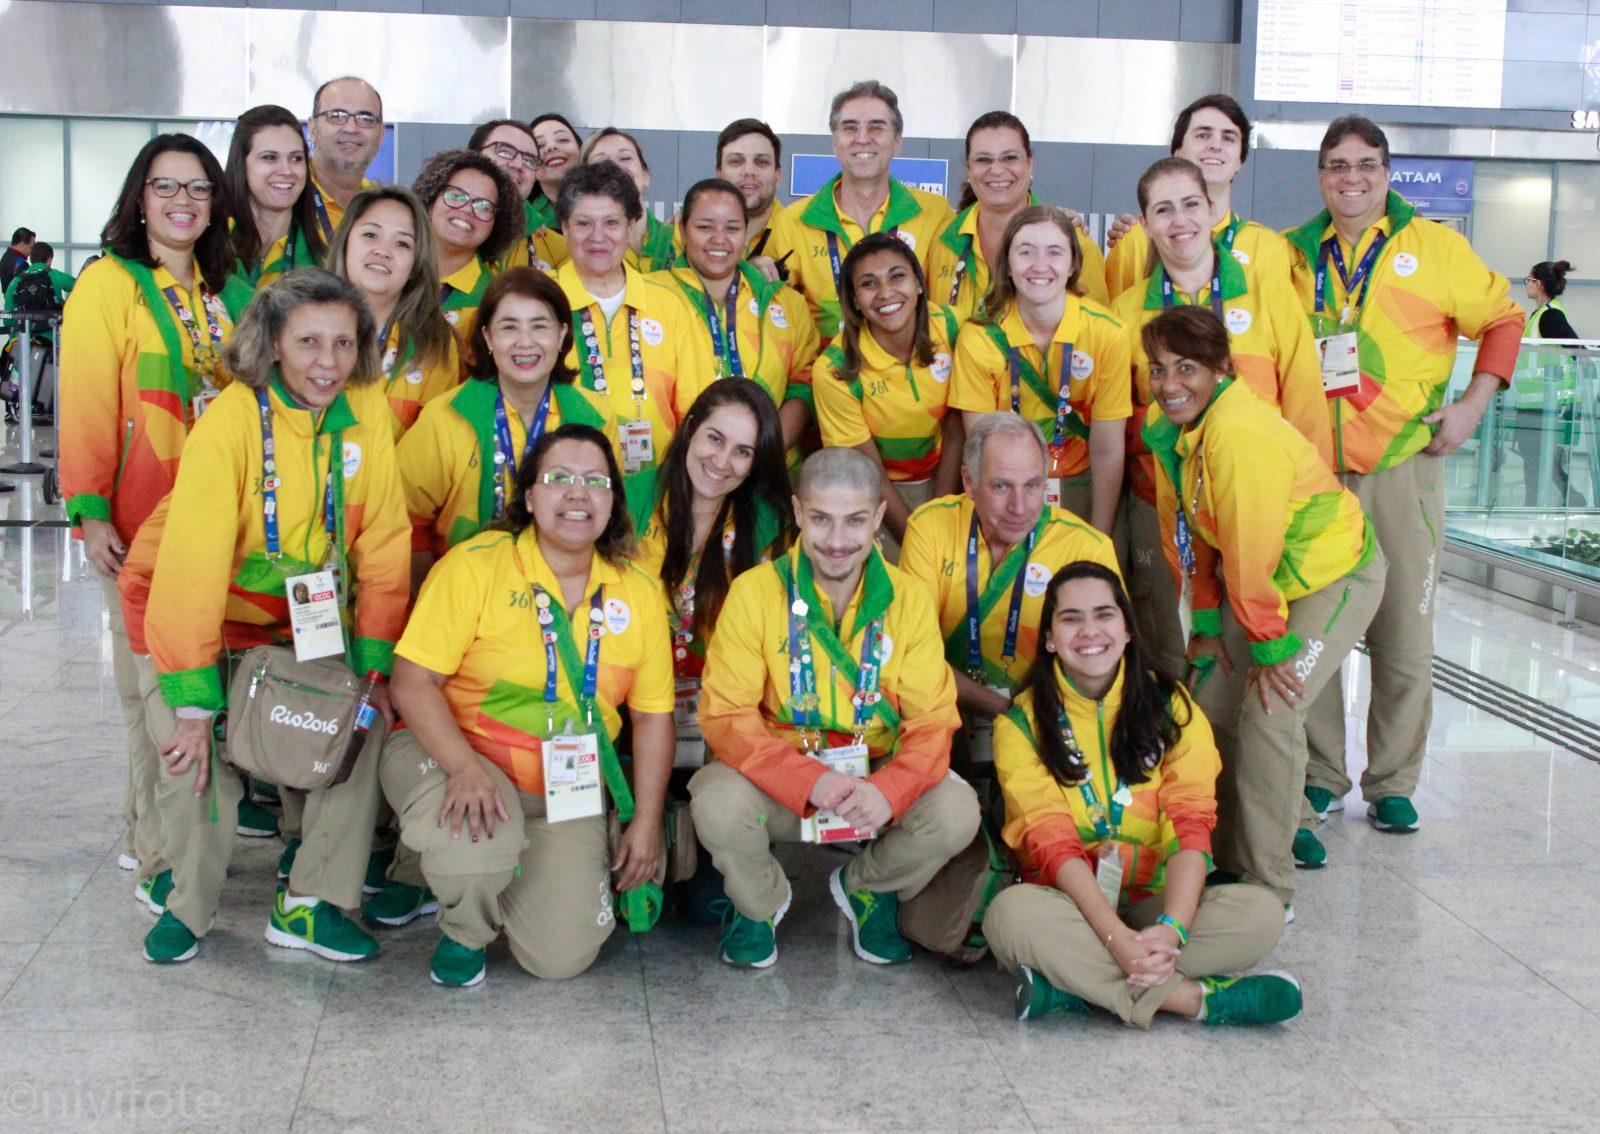 Rio 2016 AAD Guarulhos Volunteers Airport Team-Sao Paulo